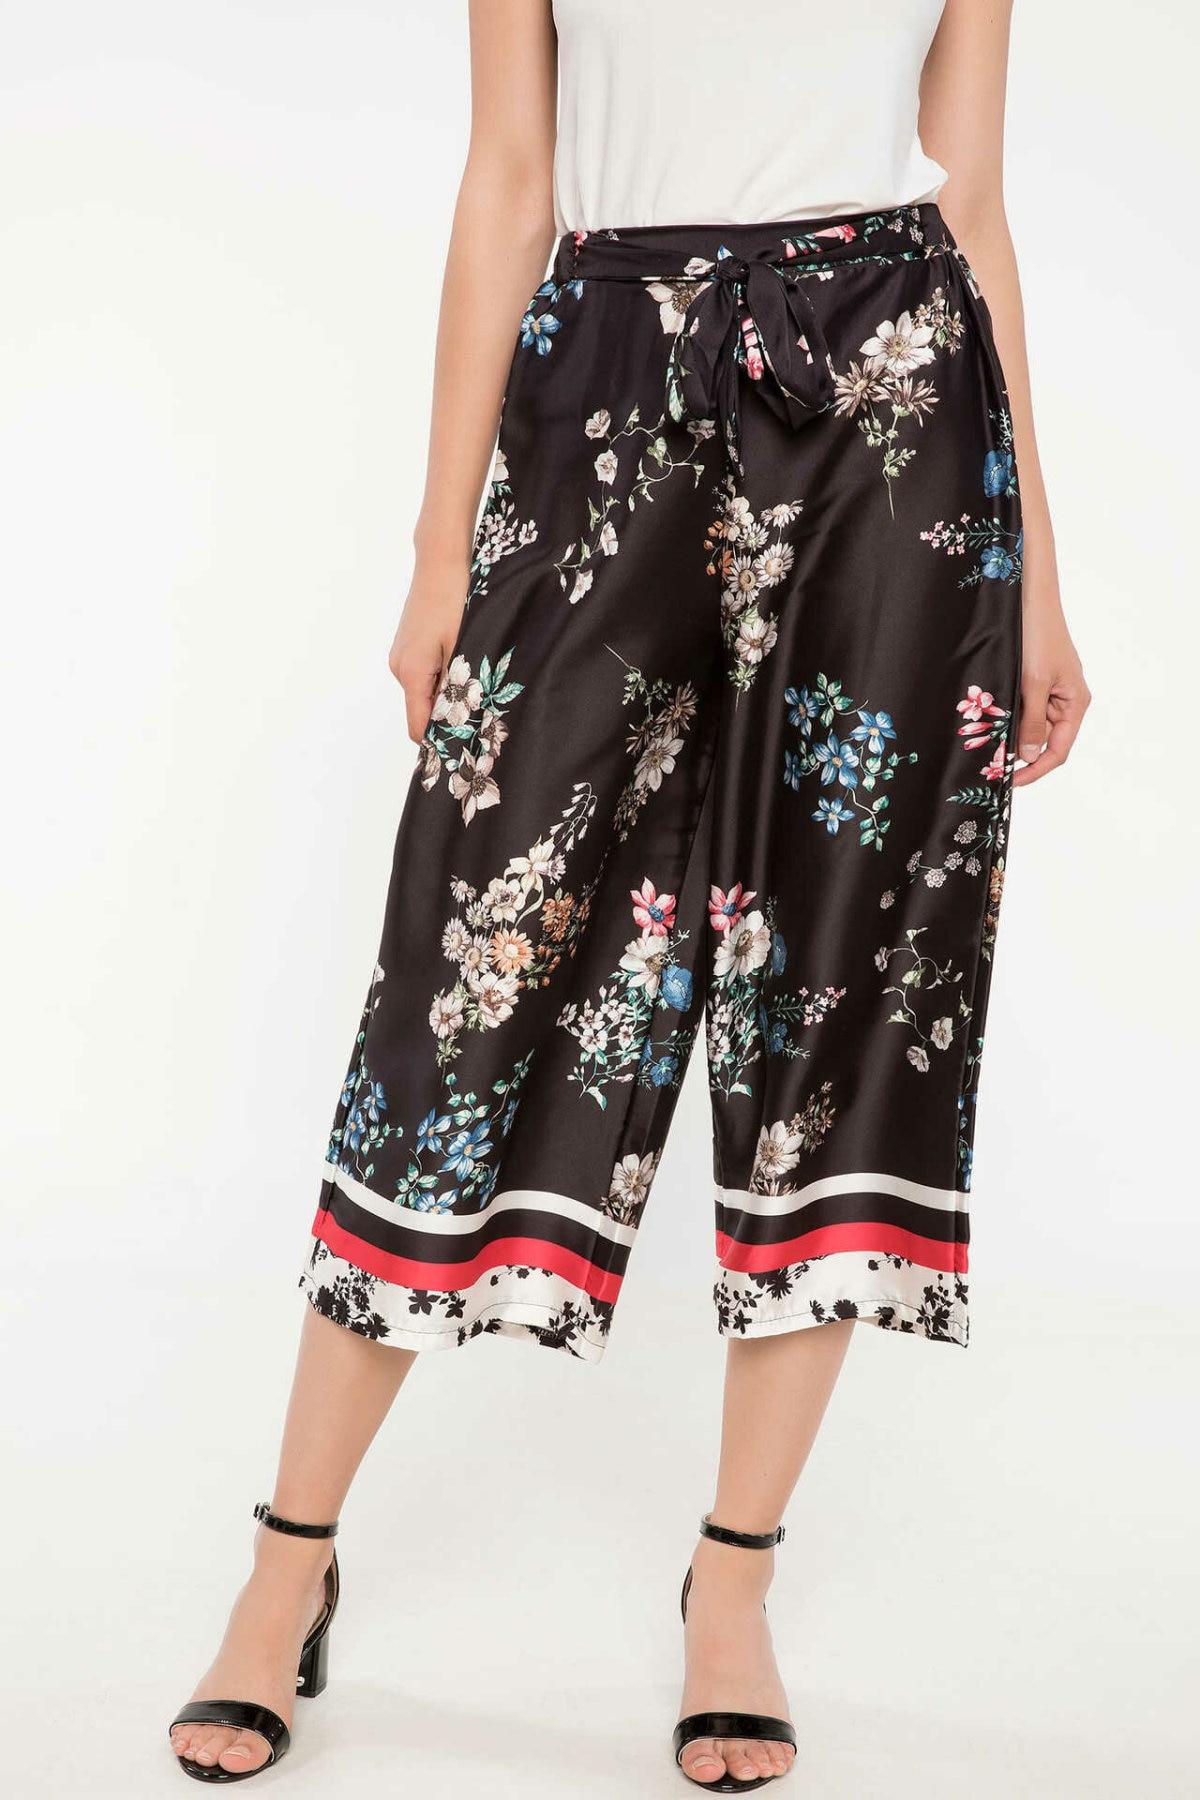 DeFacto Ladies Fashion Print Chiffon Loose Trousers For Women's Casual Pants Straight Comfort Crop Pants Female - J5382AZ18HS